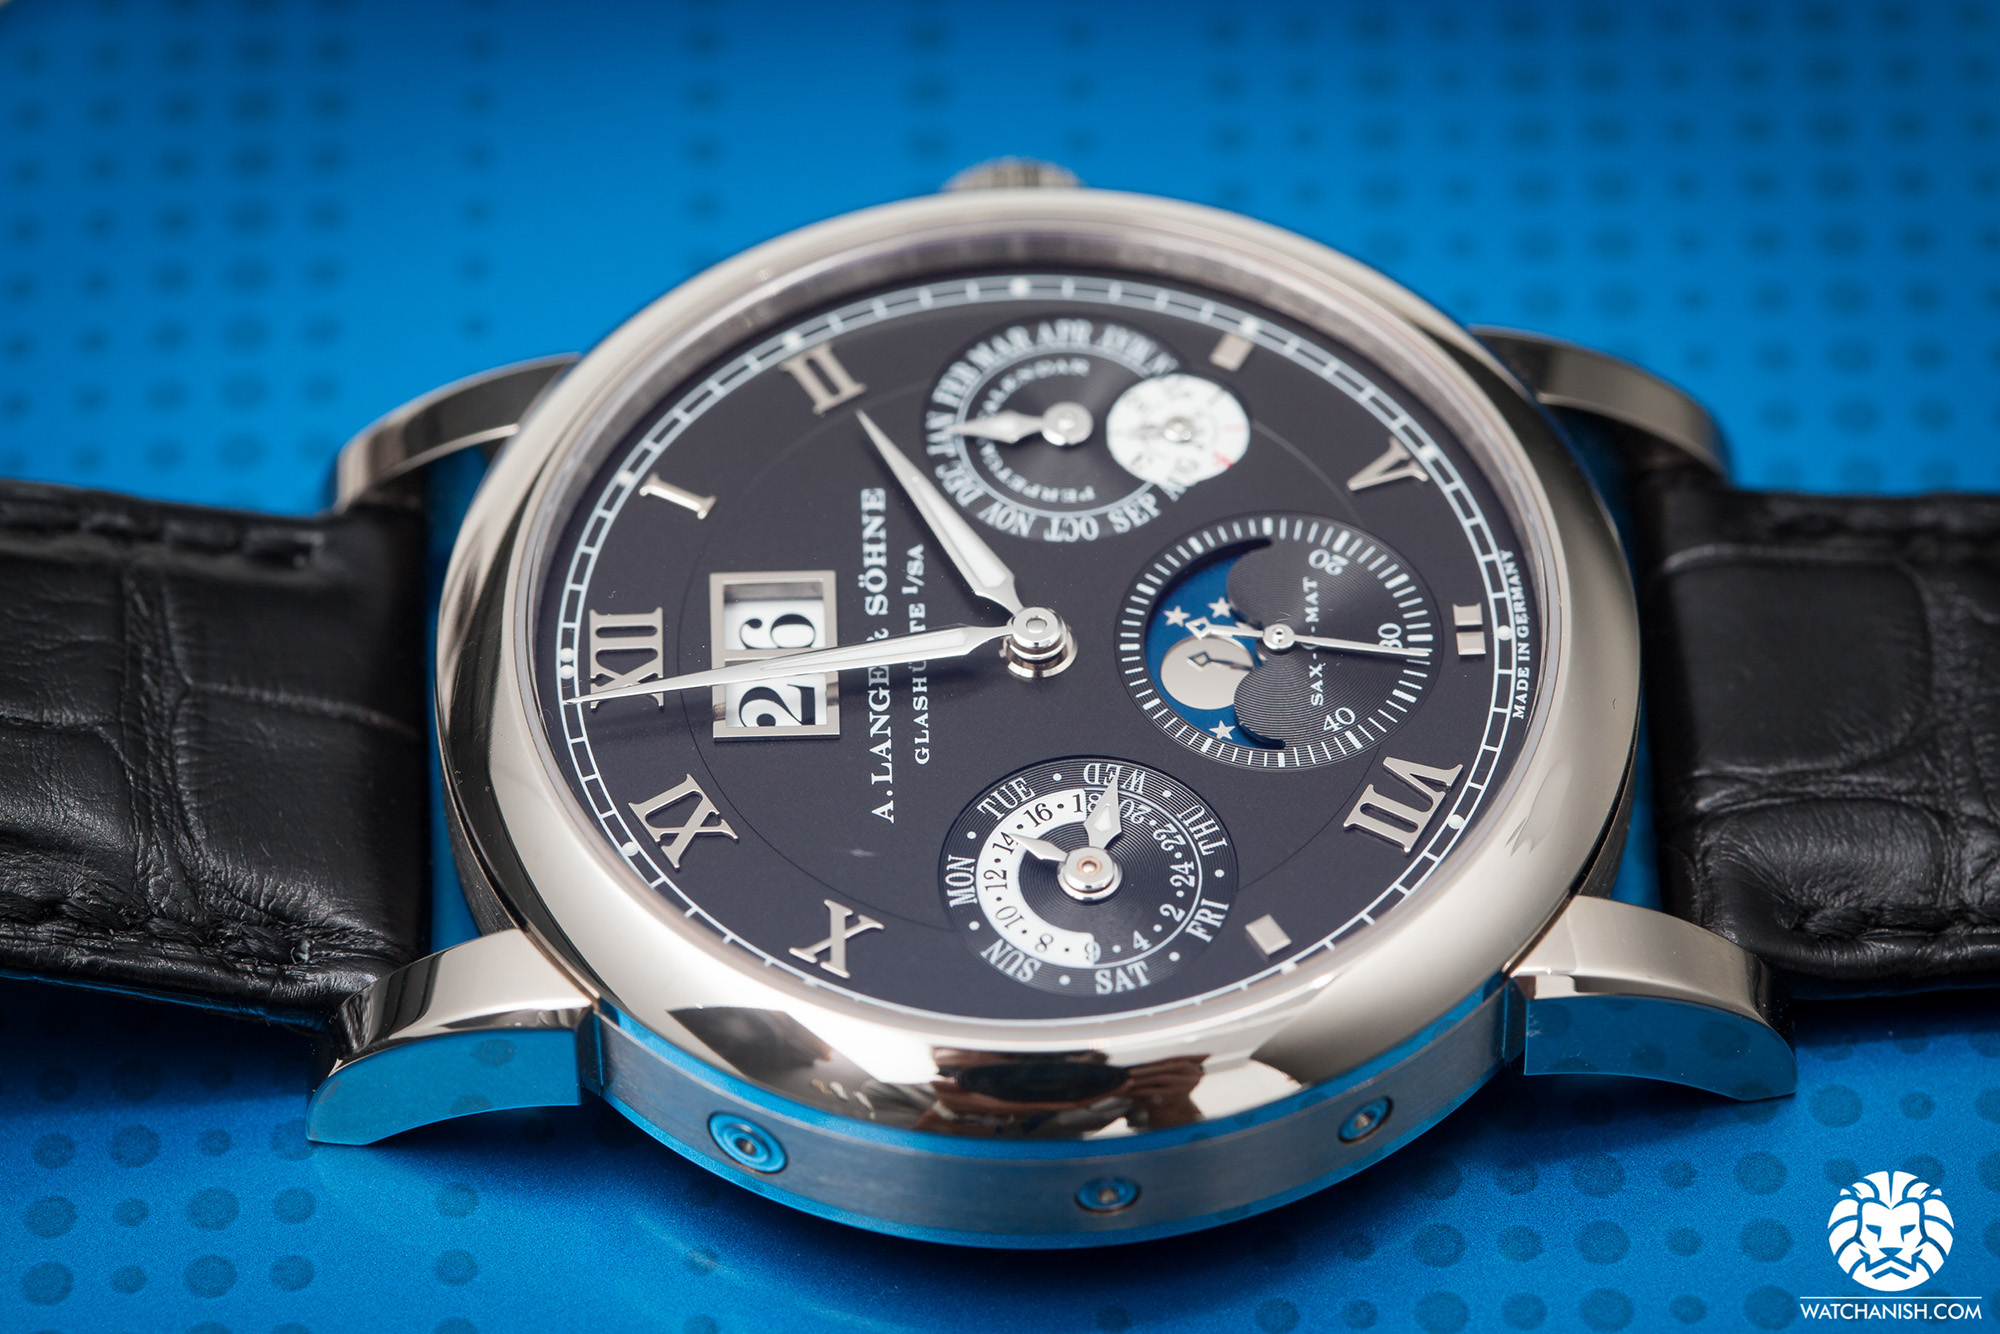 Watches & Wonders 2014 - A. Lange & Söhne Langematik Perpetual Calendar